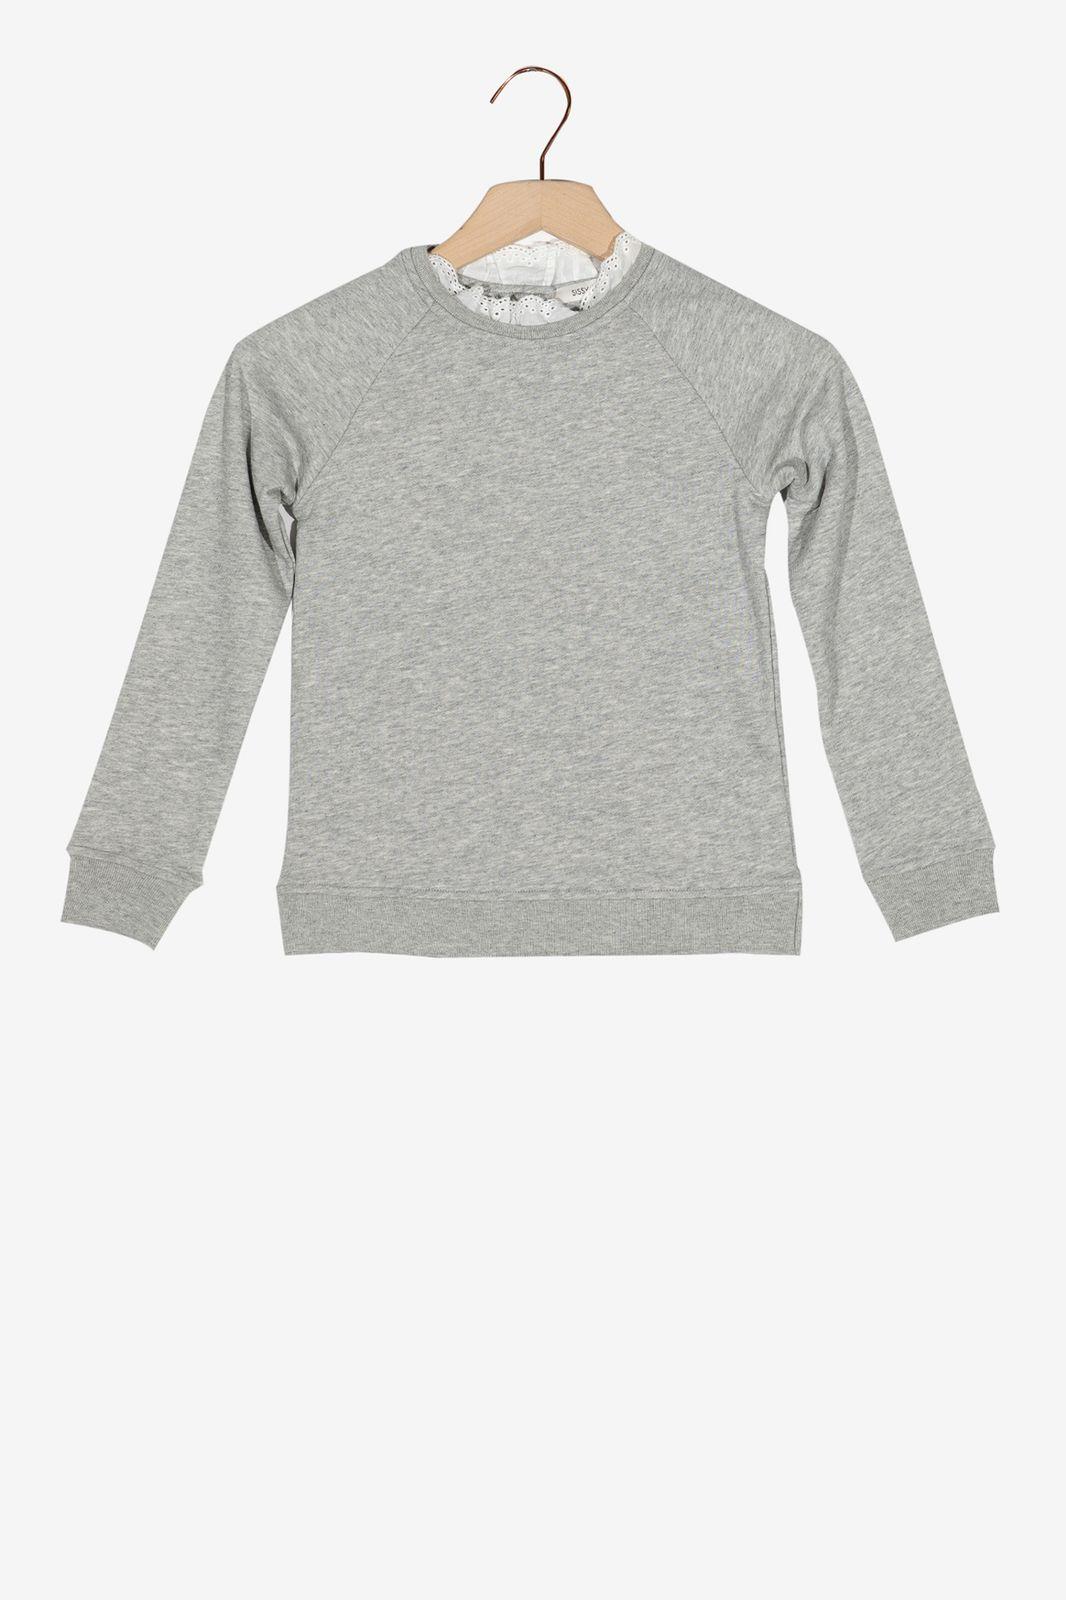 Grijze sweater met wit kraagje